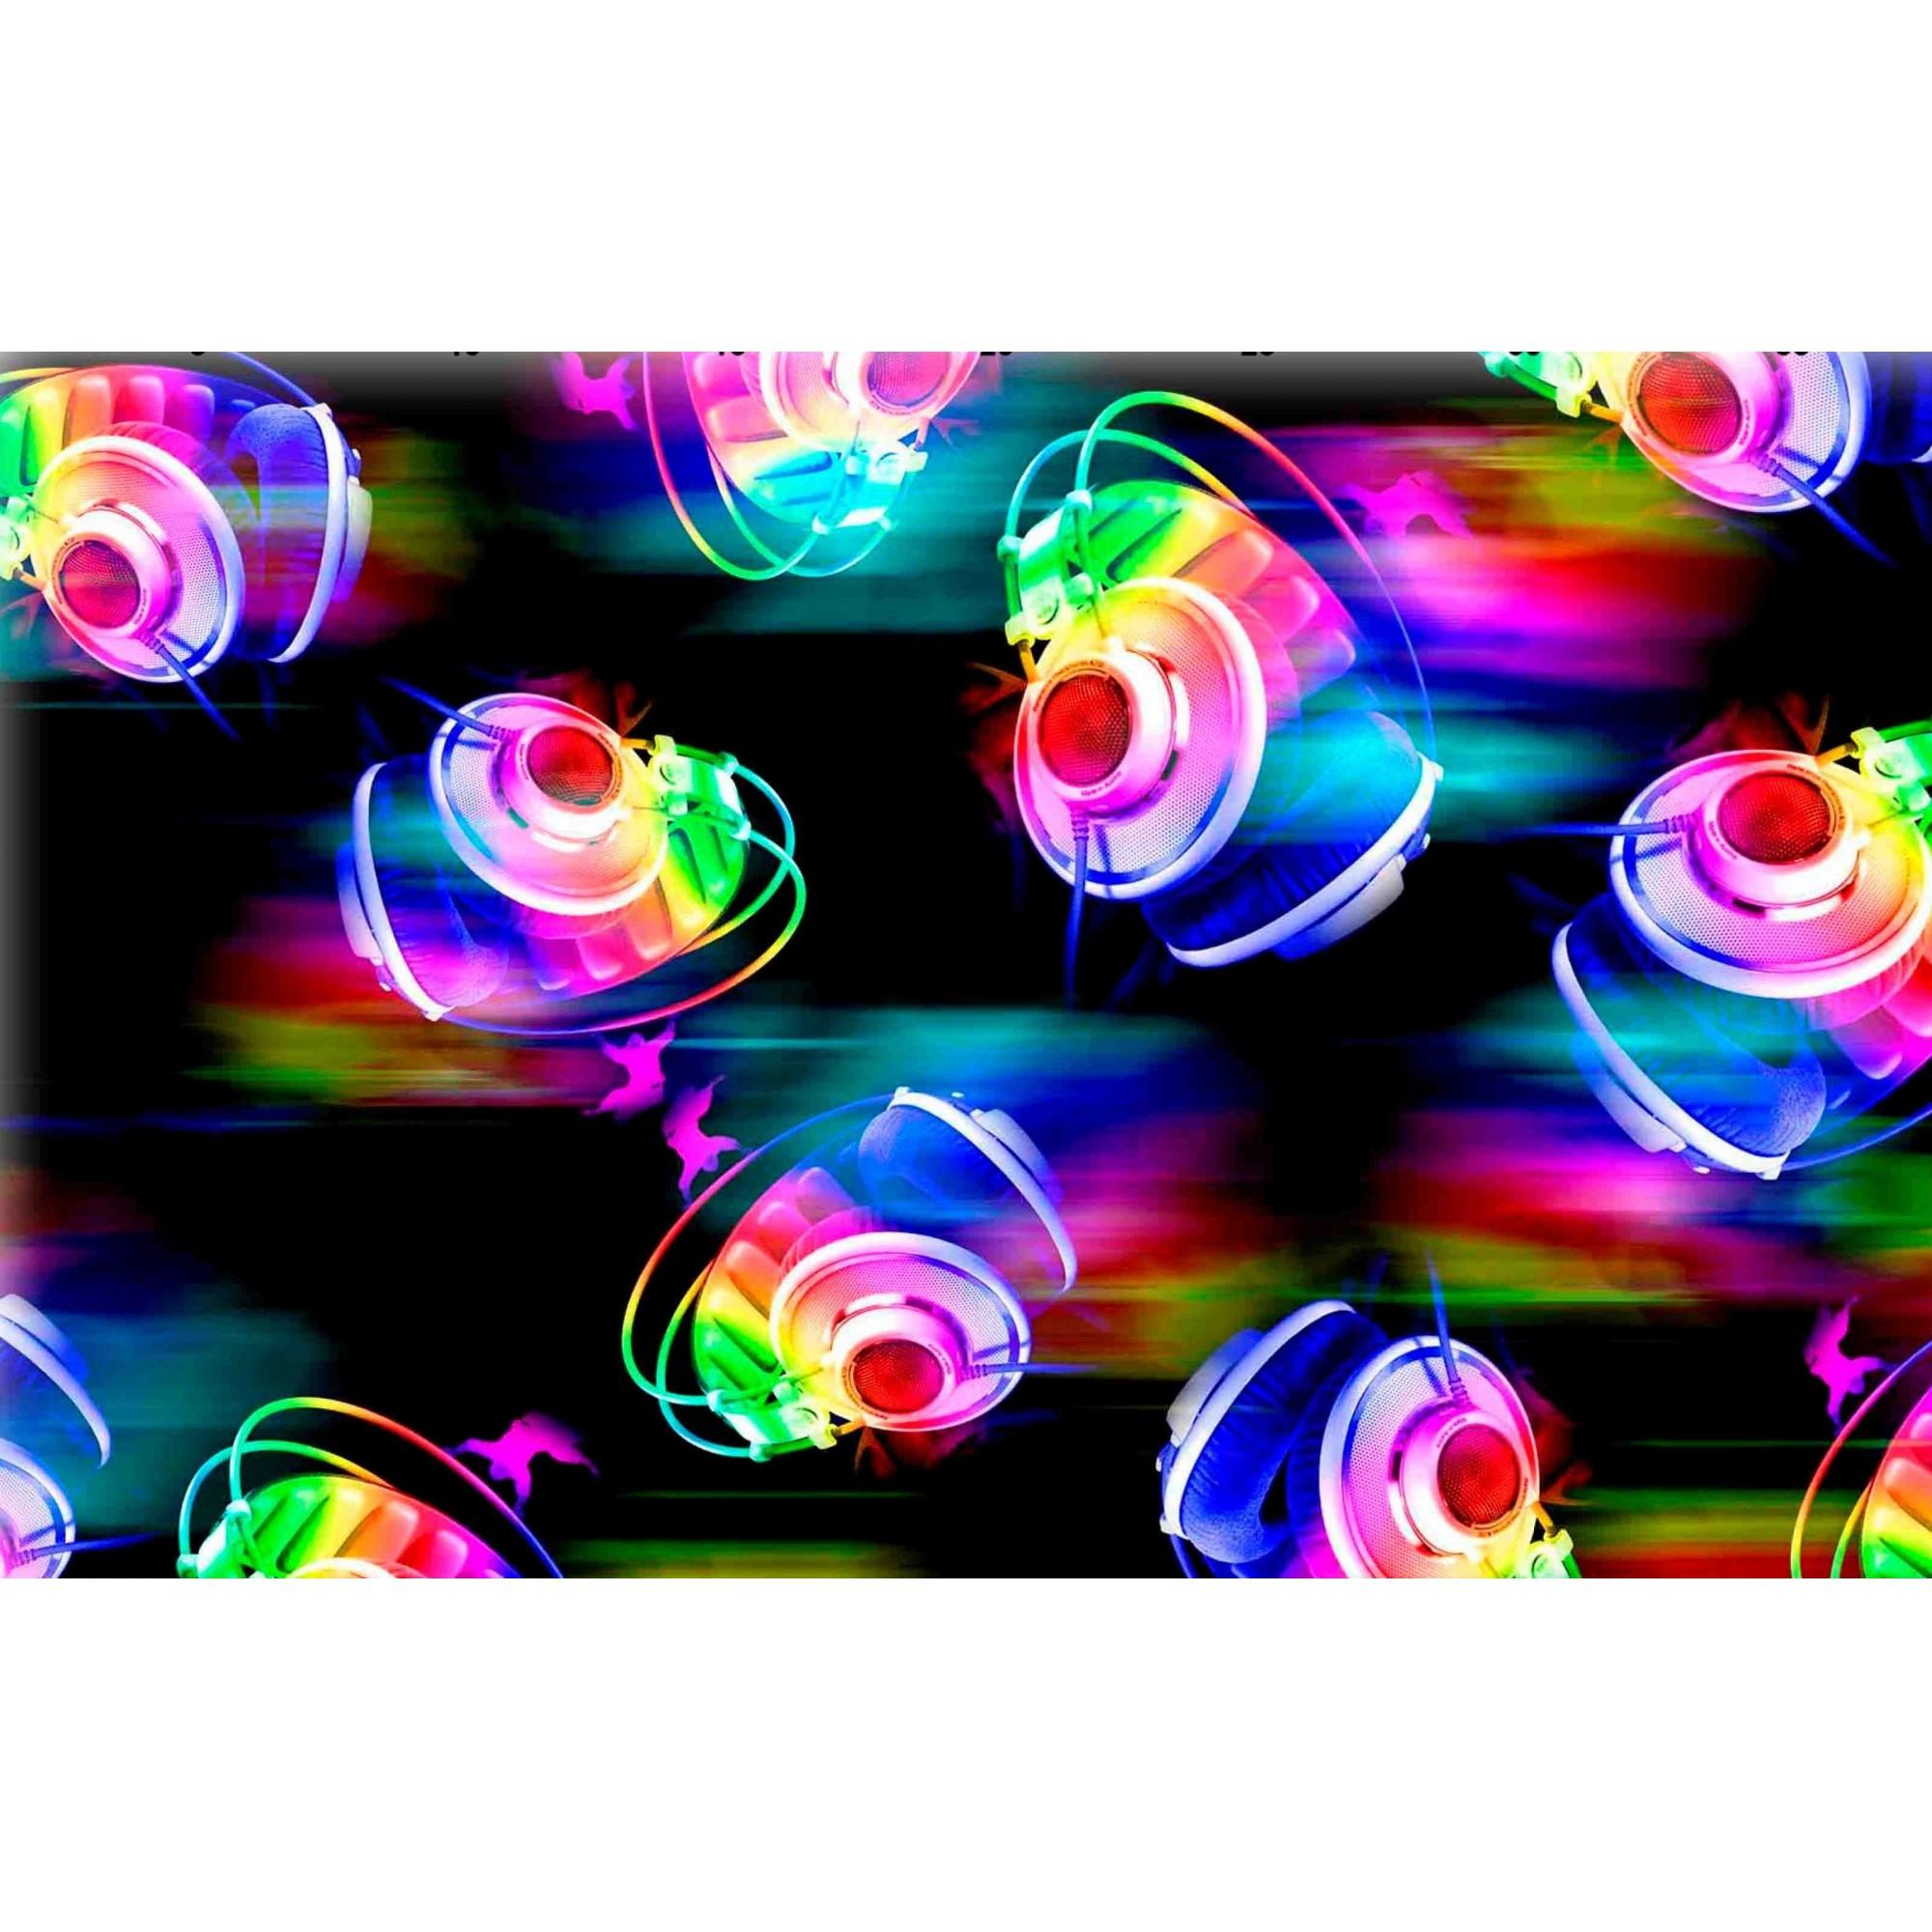 Meryl Digital Estampado (60859-1)